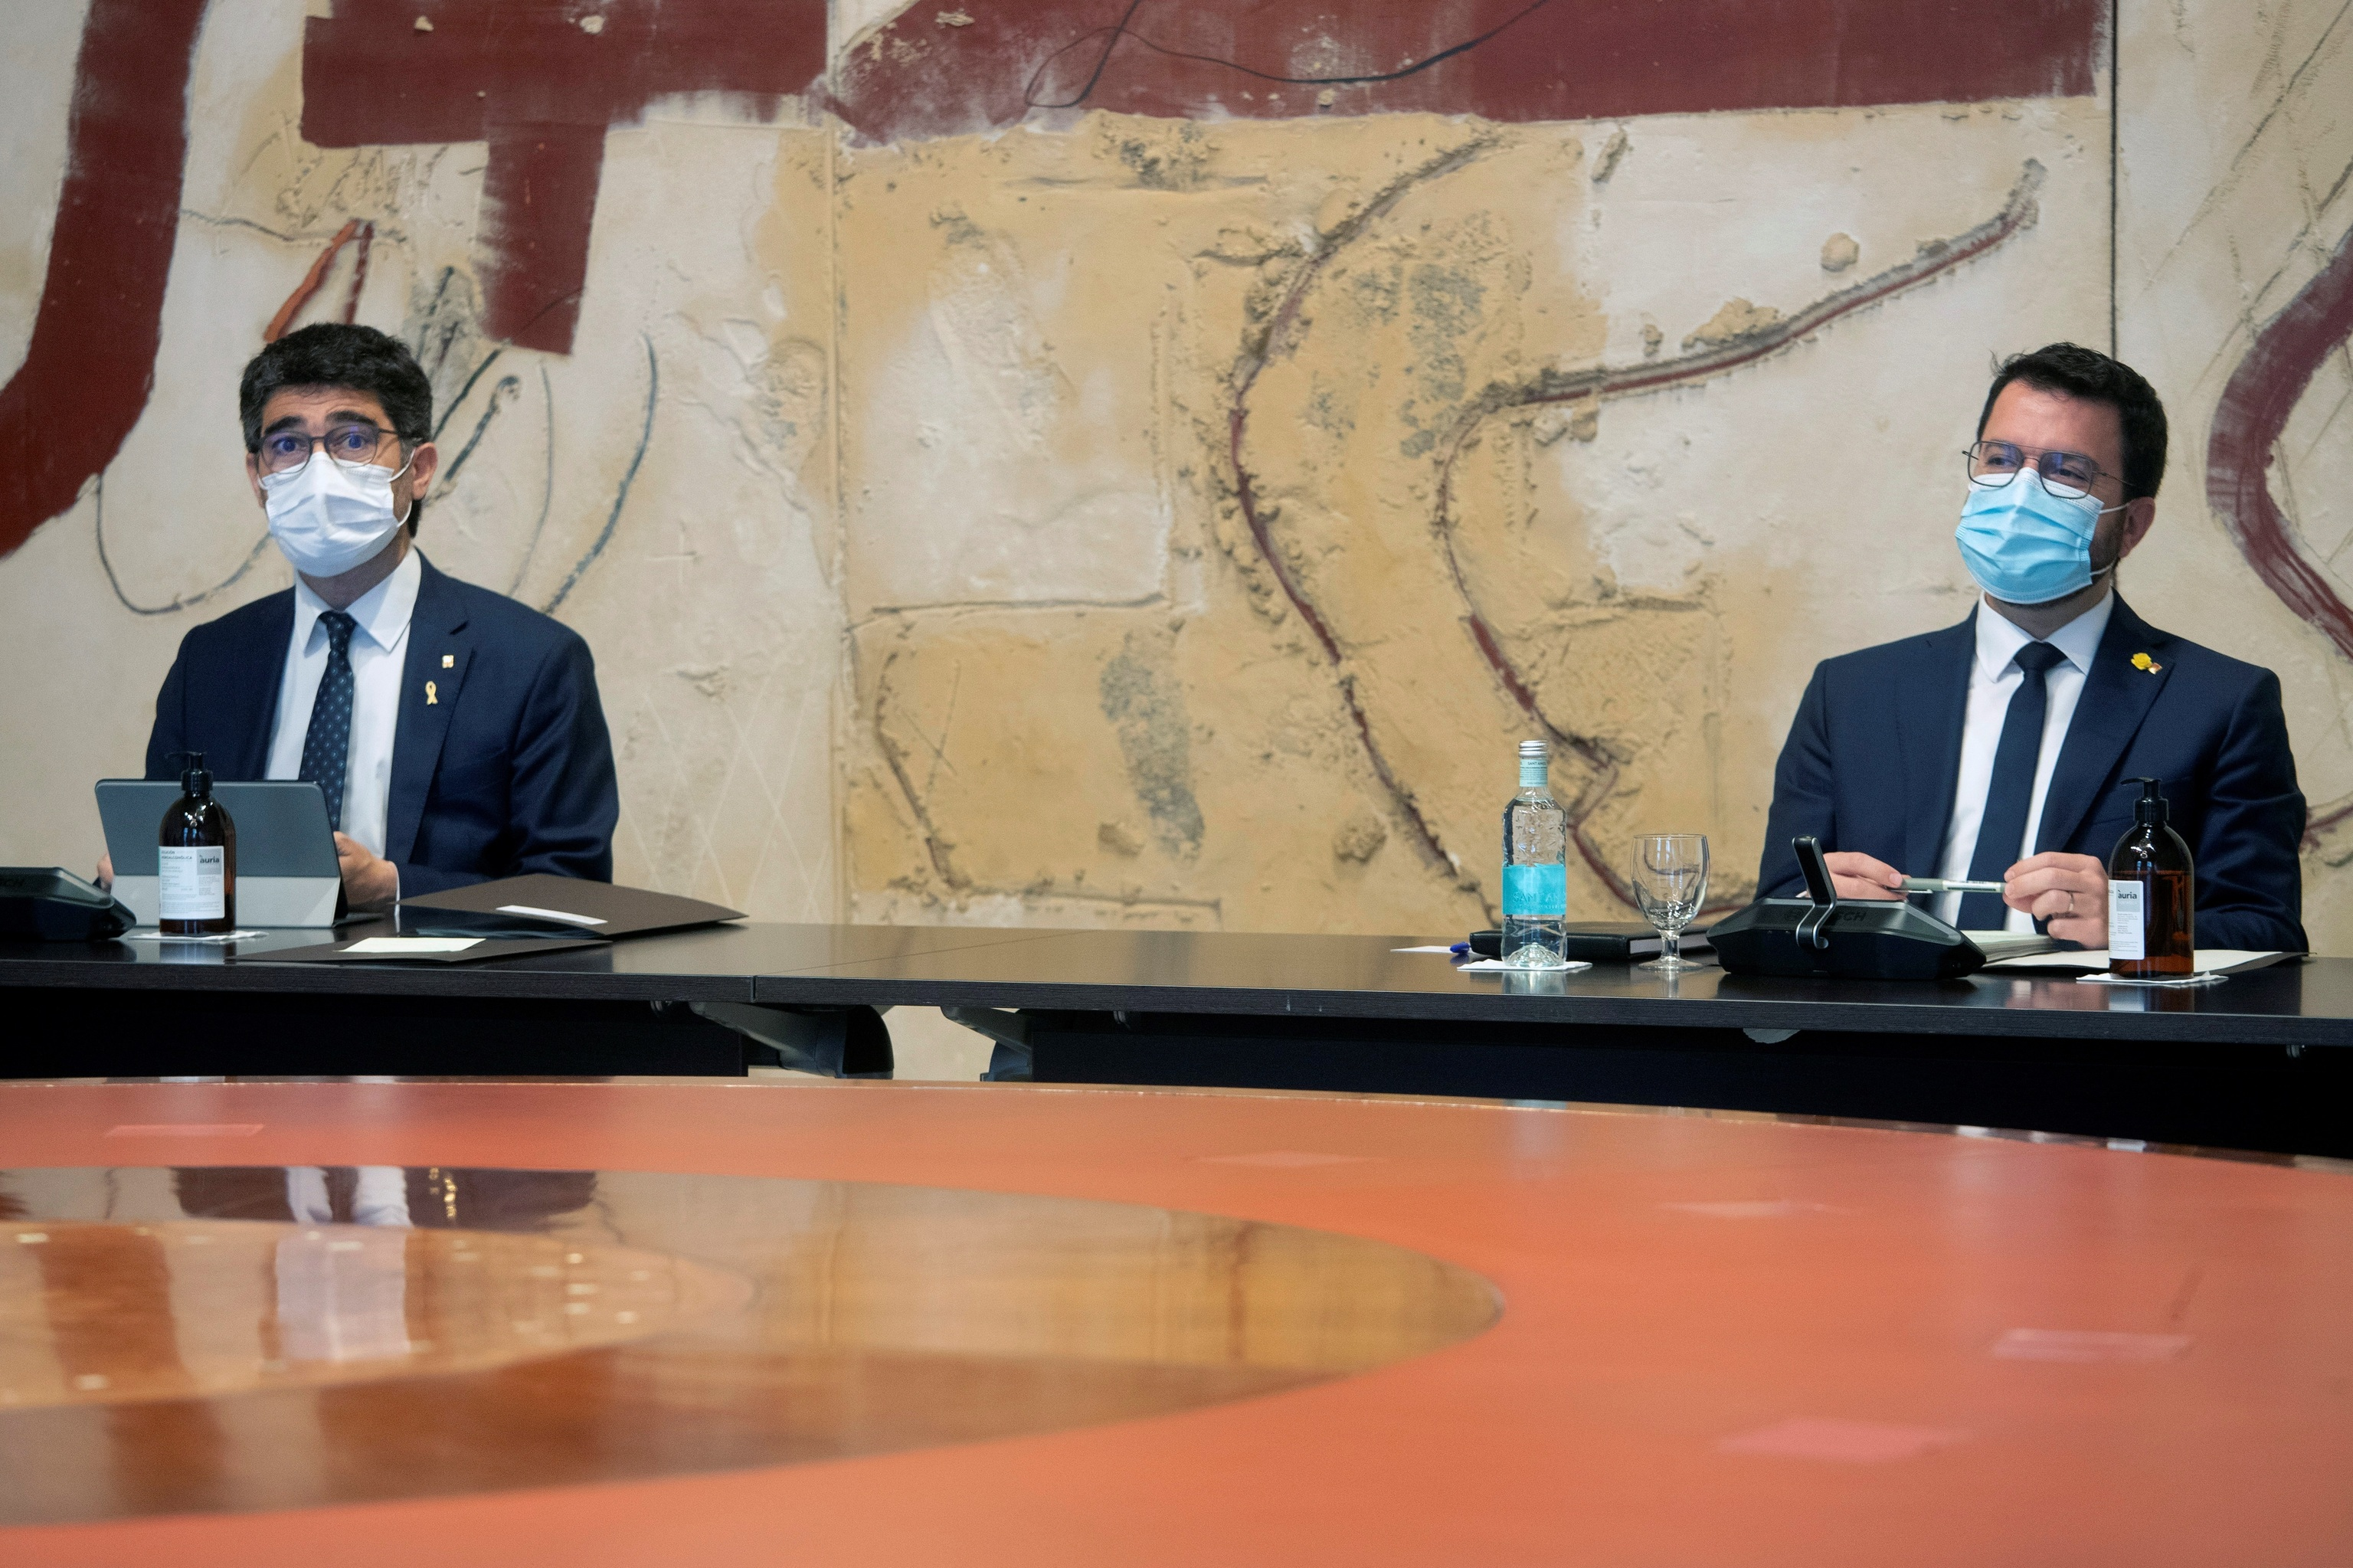 Pere Aragonès y Jordi Puigneró en la reunión semanal del Govern